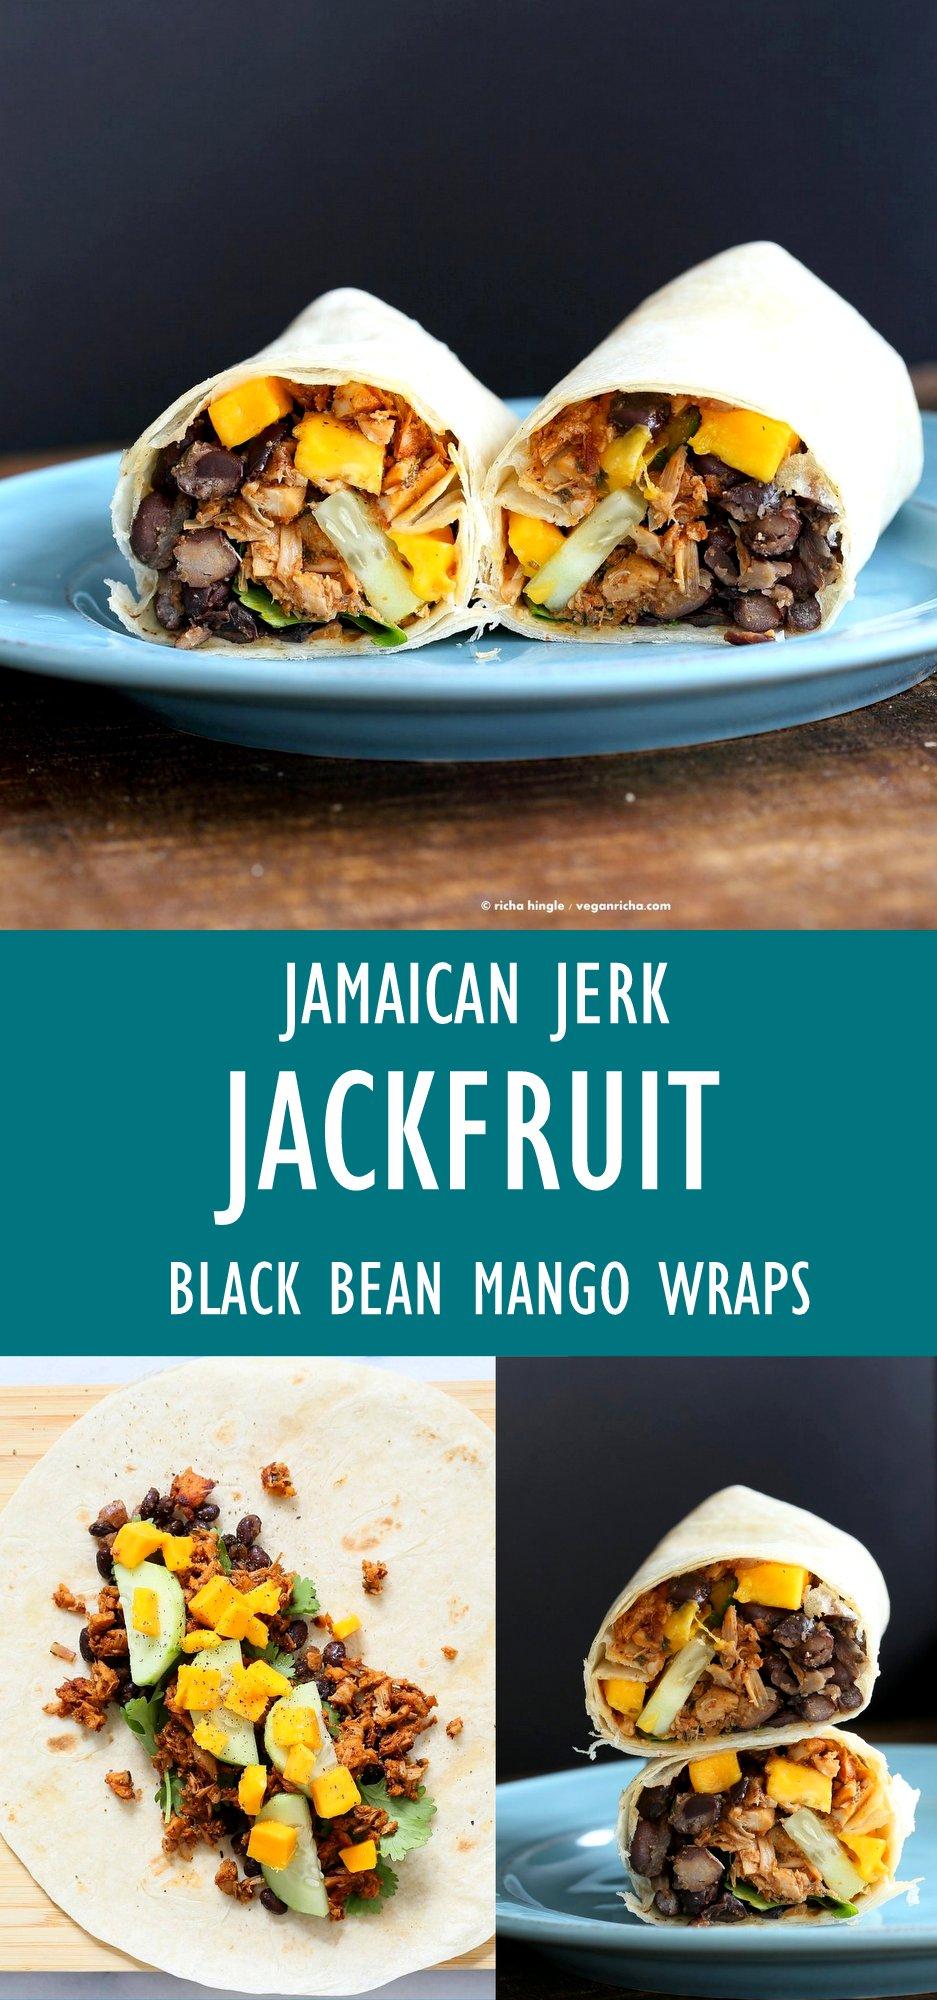 Jamaican Jerk Jackfruit Caribbean Black Bean Mango Wraps Vegan Richa